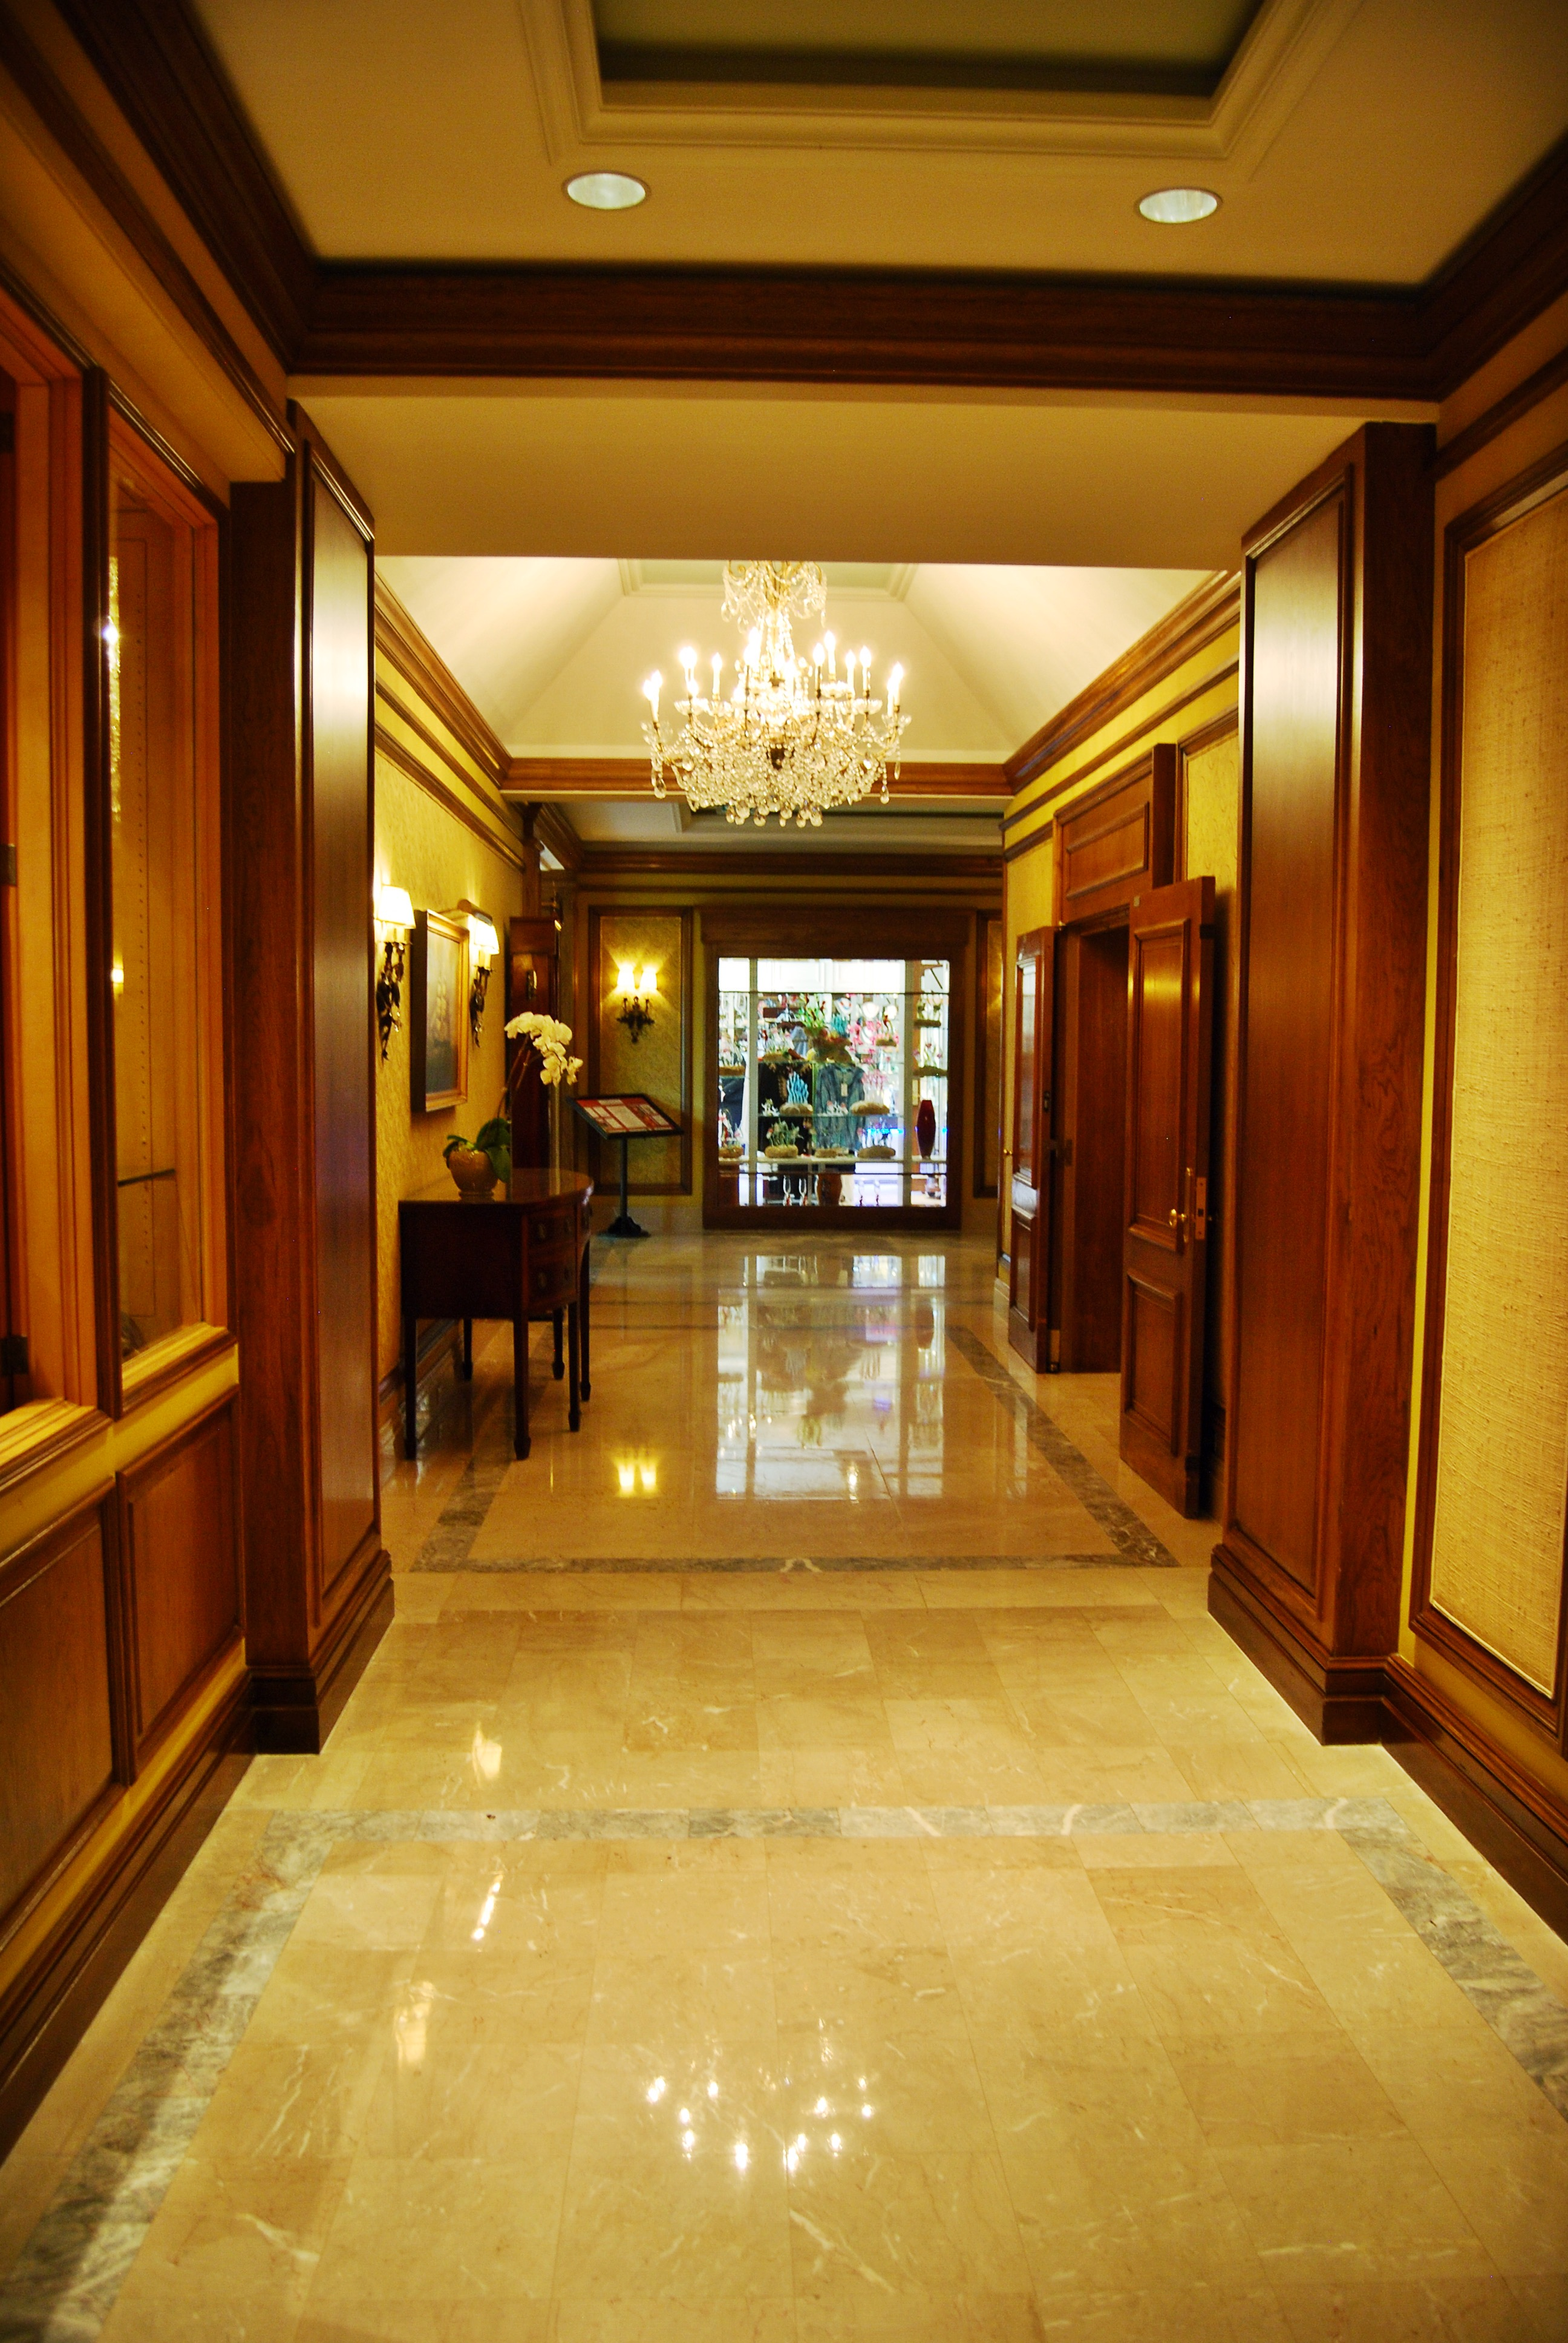 Amelia Island: Brunch at The Ritz Carlton | Breezing Through